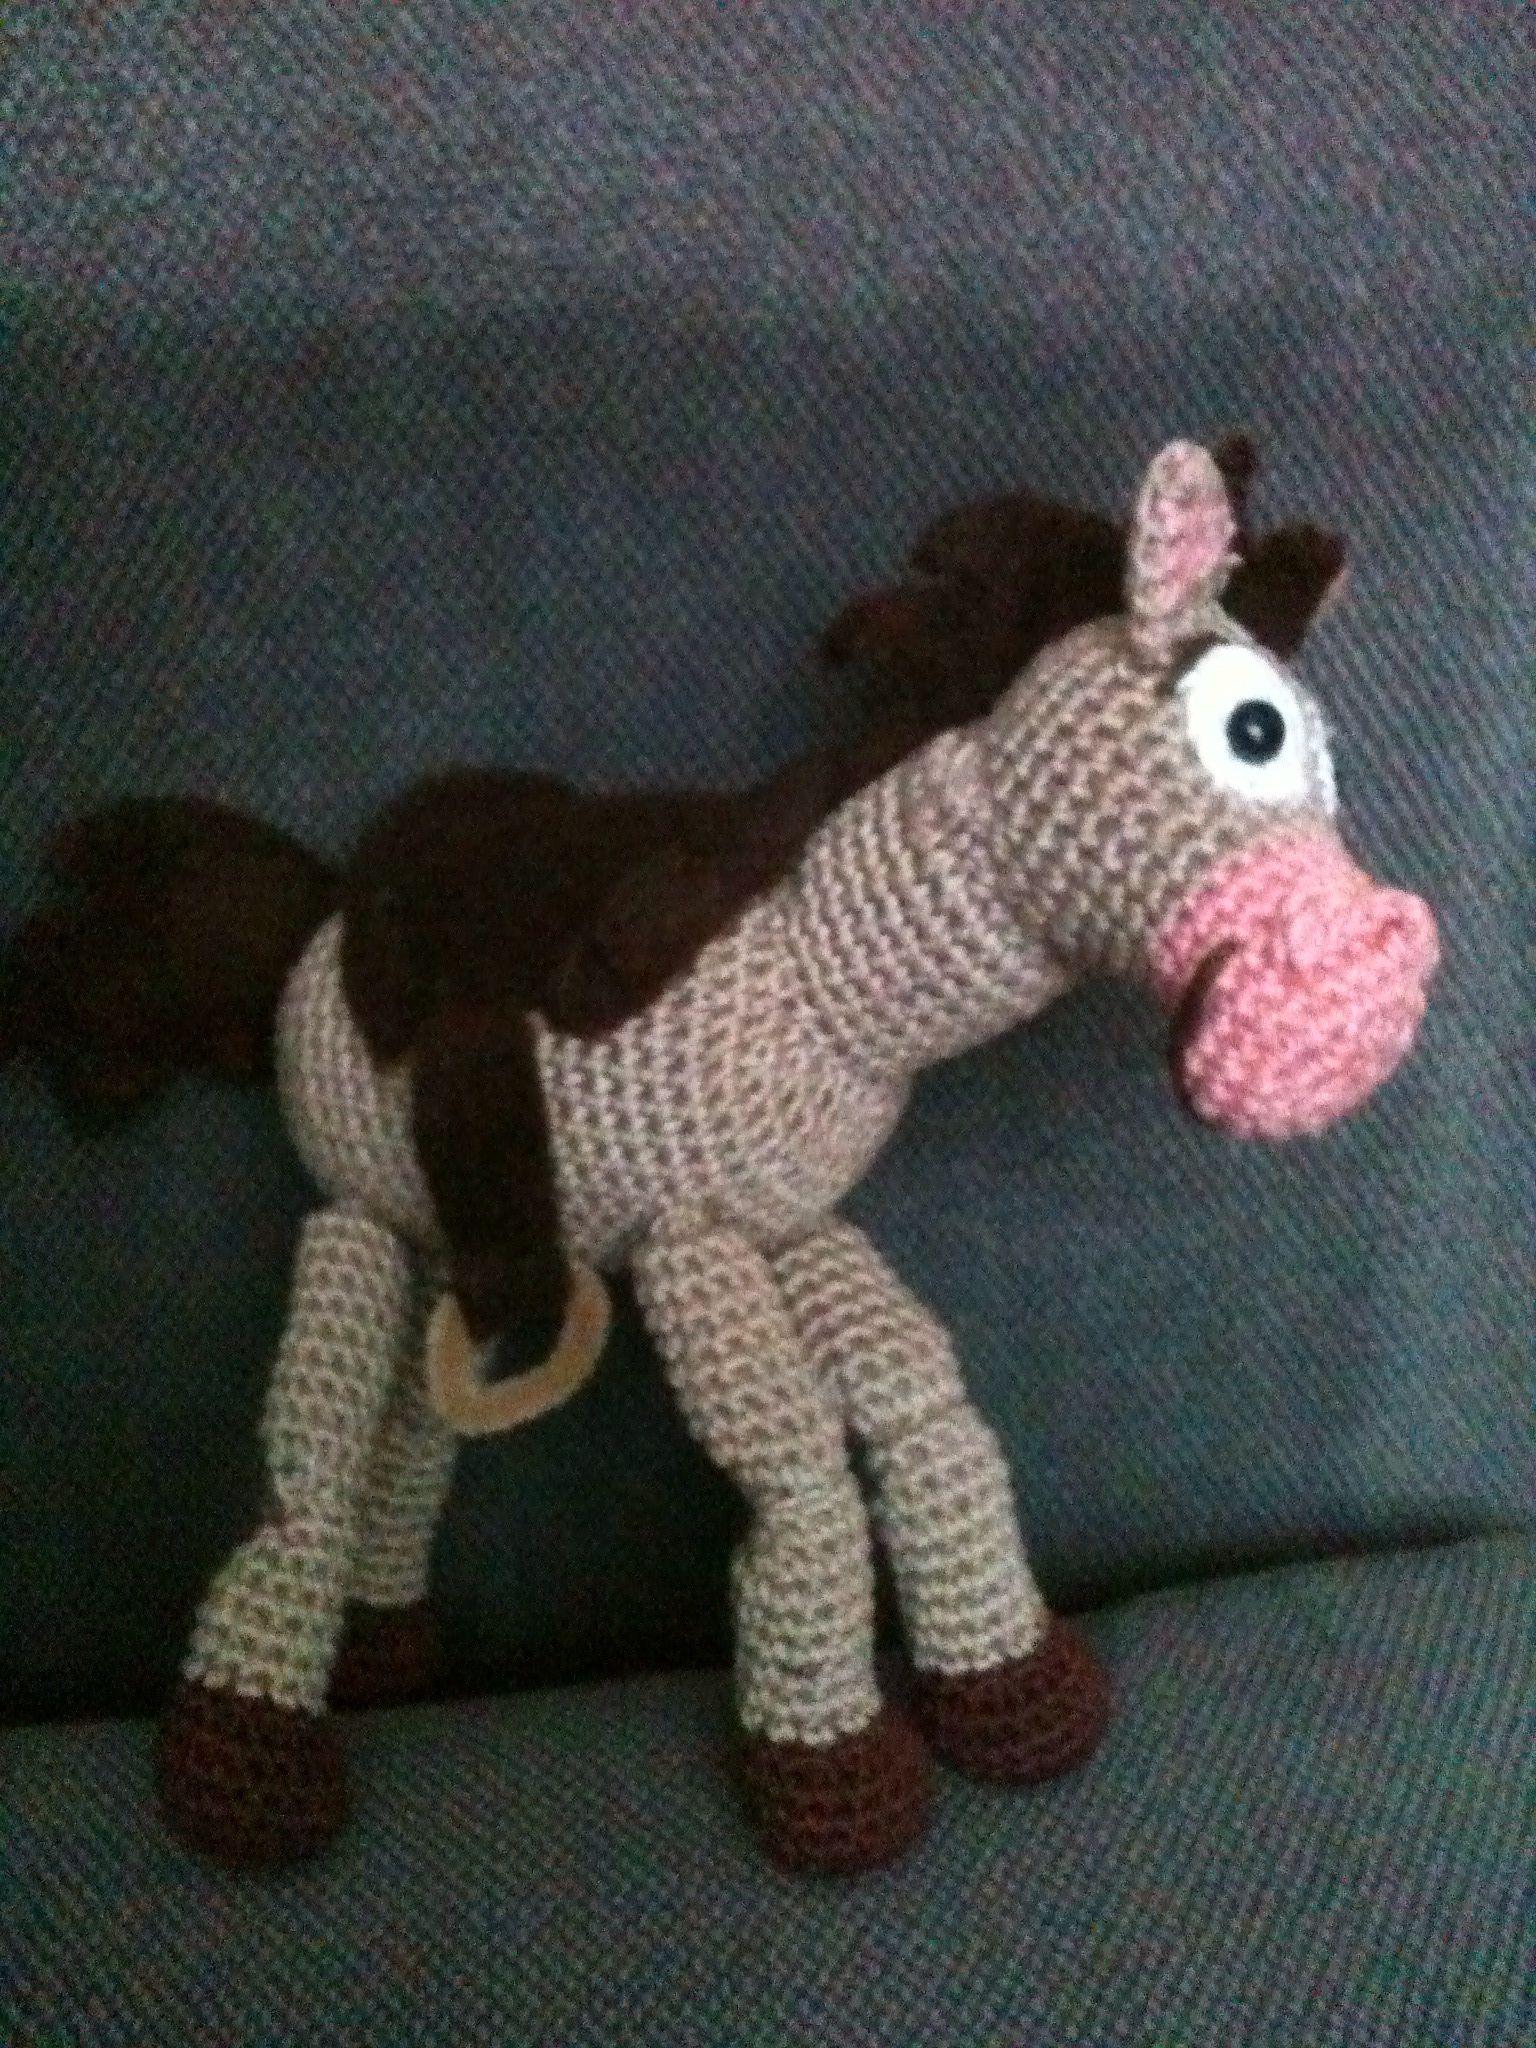 Amigurumi Chofisgurumi, Tiro al blanco, Toy Story, tejido a crochet ...